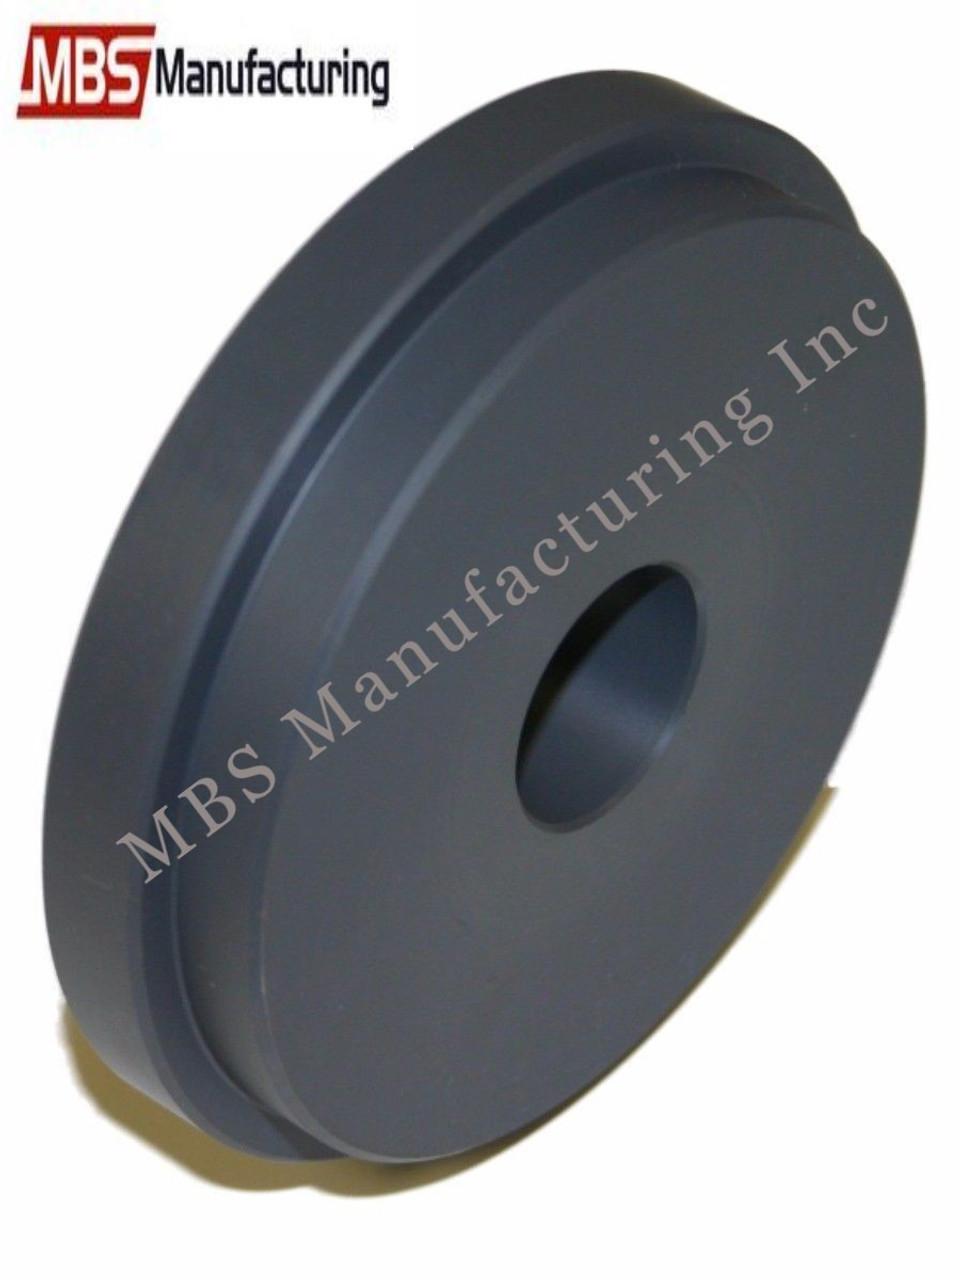 Mercruiser Bellows Replacement Tools